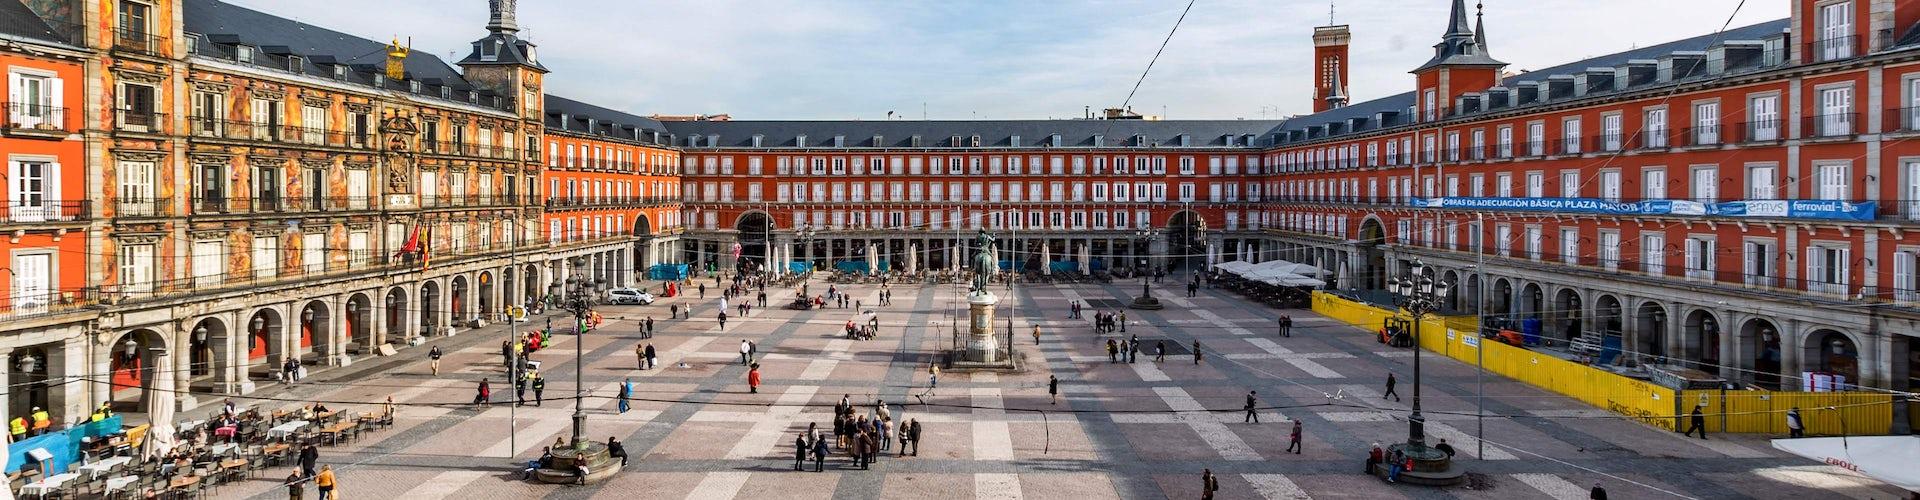 visita guiada madrid plaza real